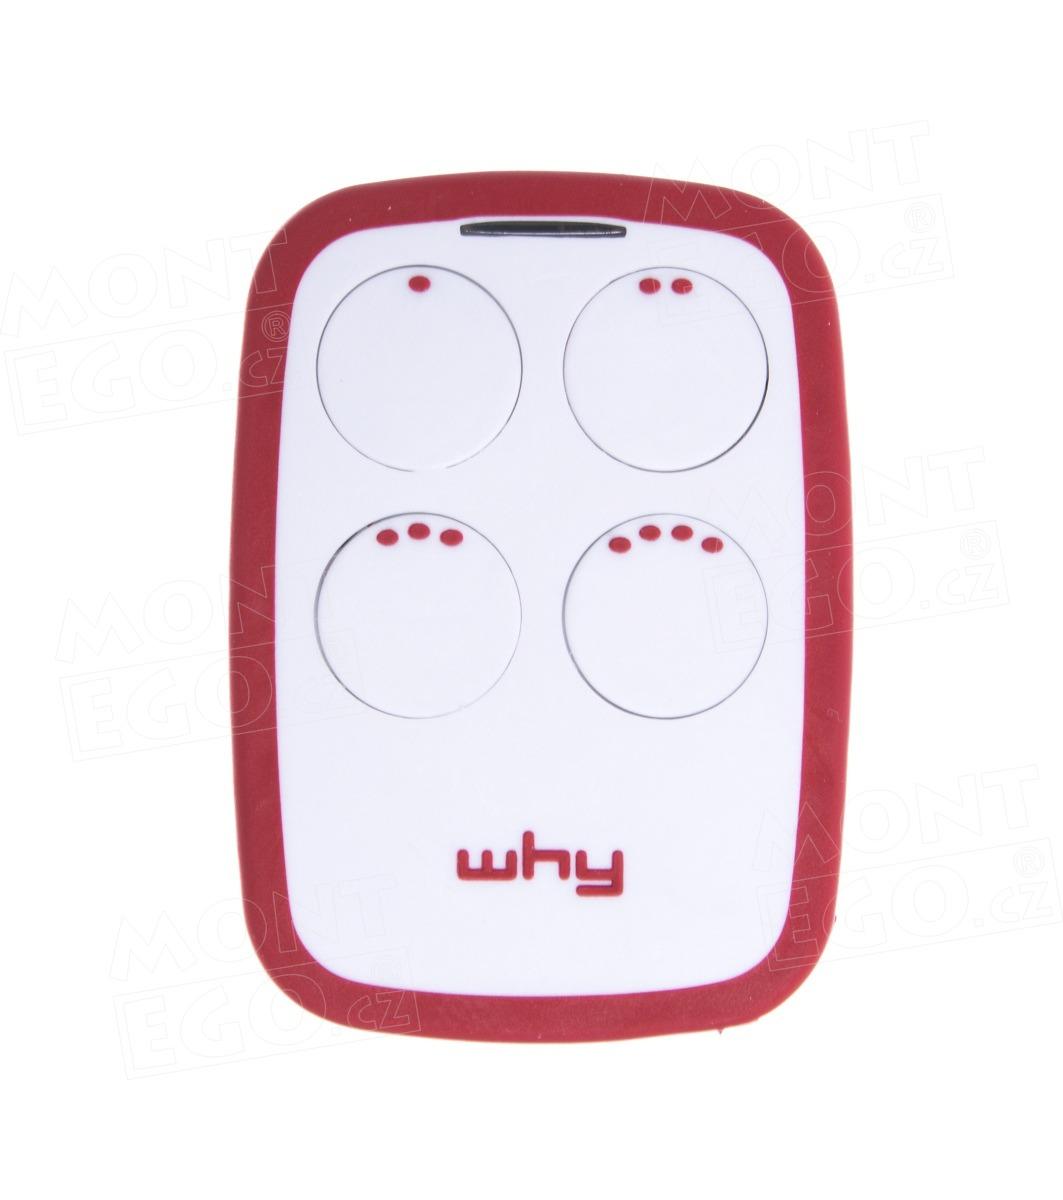 Univerzální dálkový ovladač na vrata WHY-EVO.R63, 4-kanálový, červená-bílá